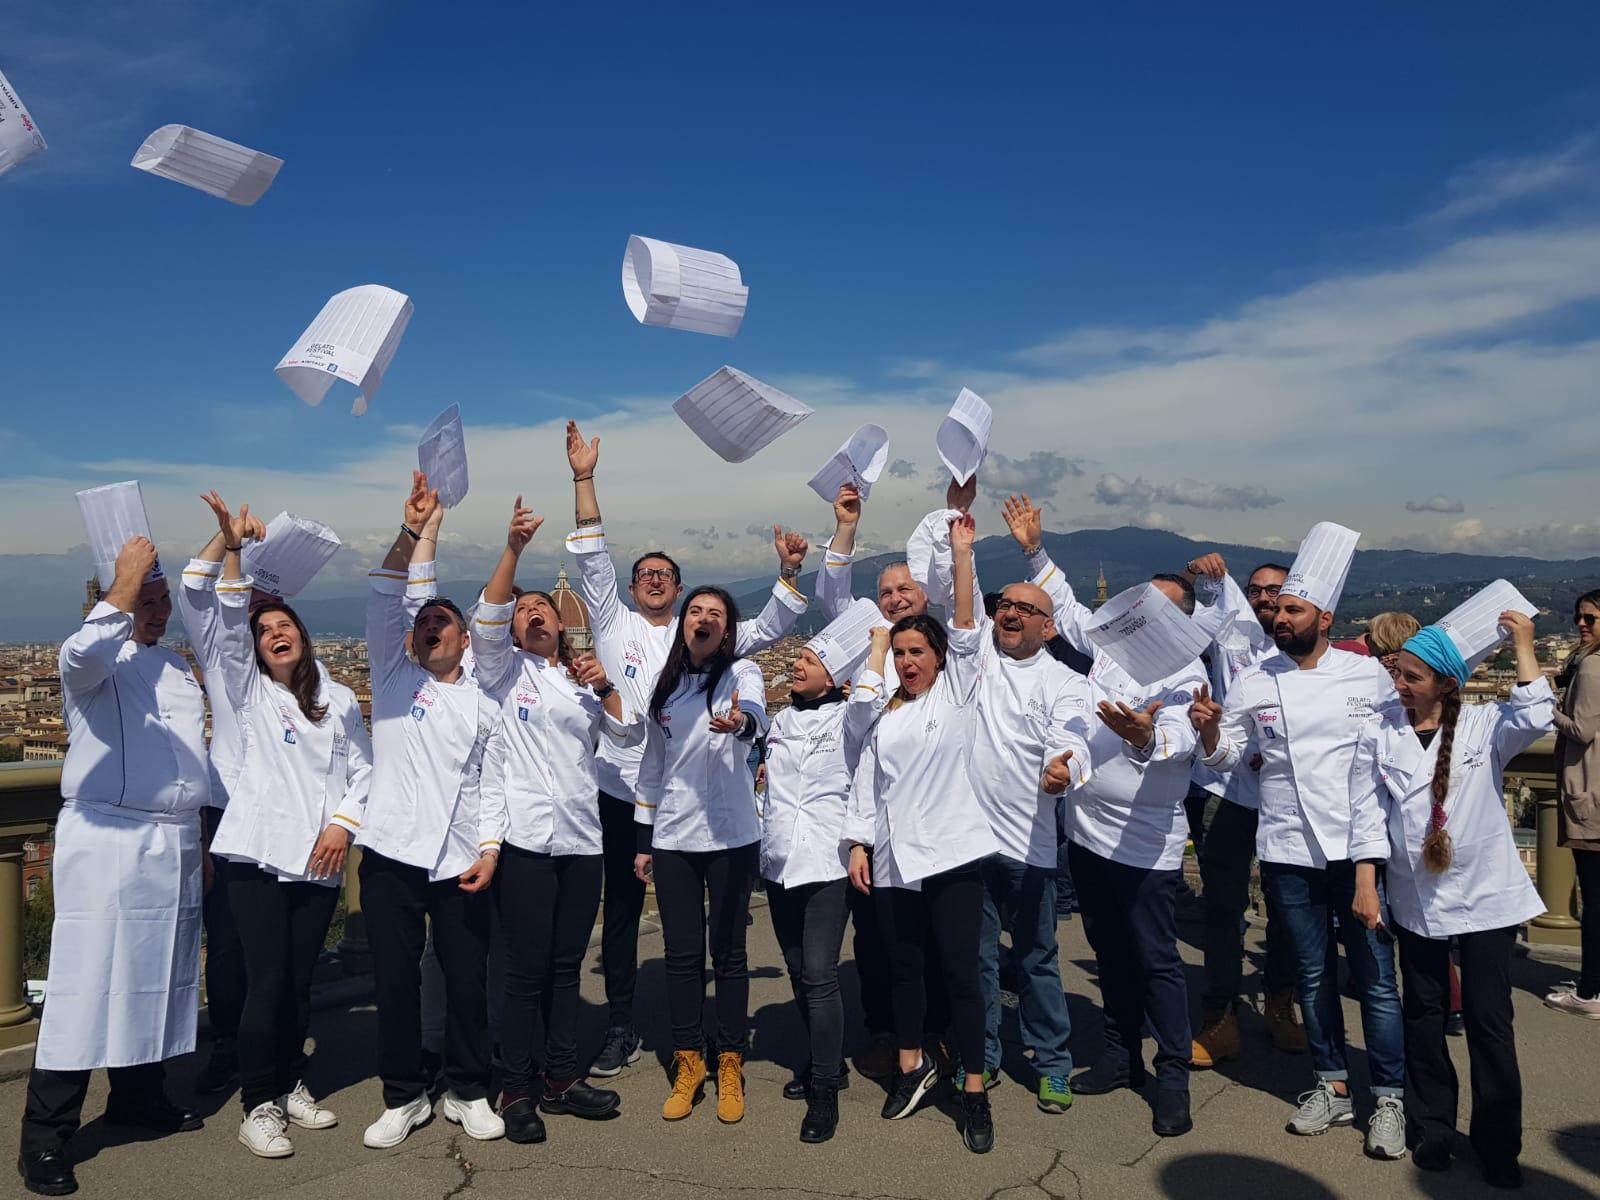 partecipanti gelato festival 2019 firenze